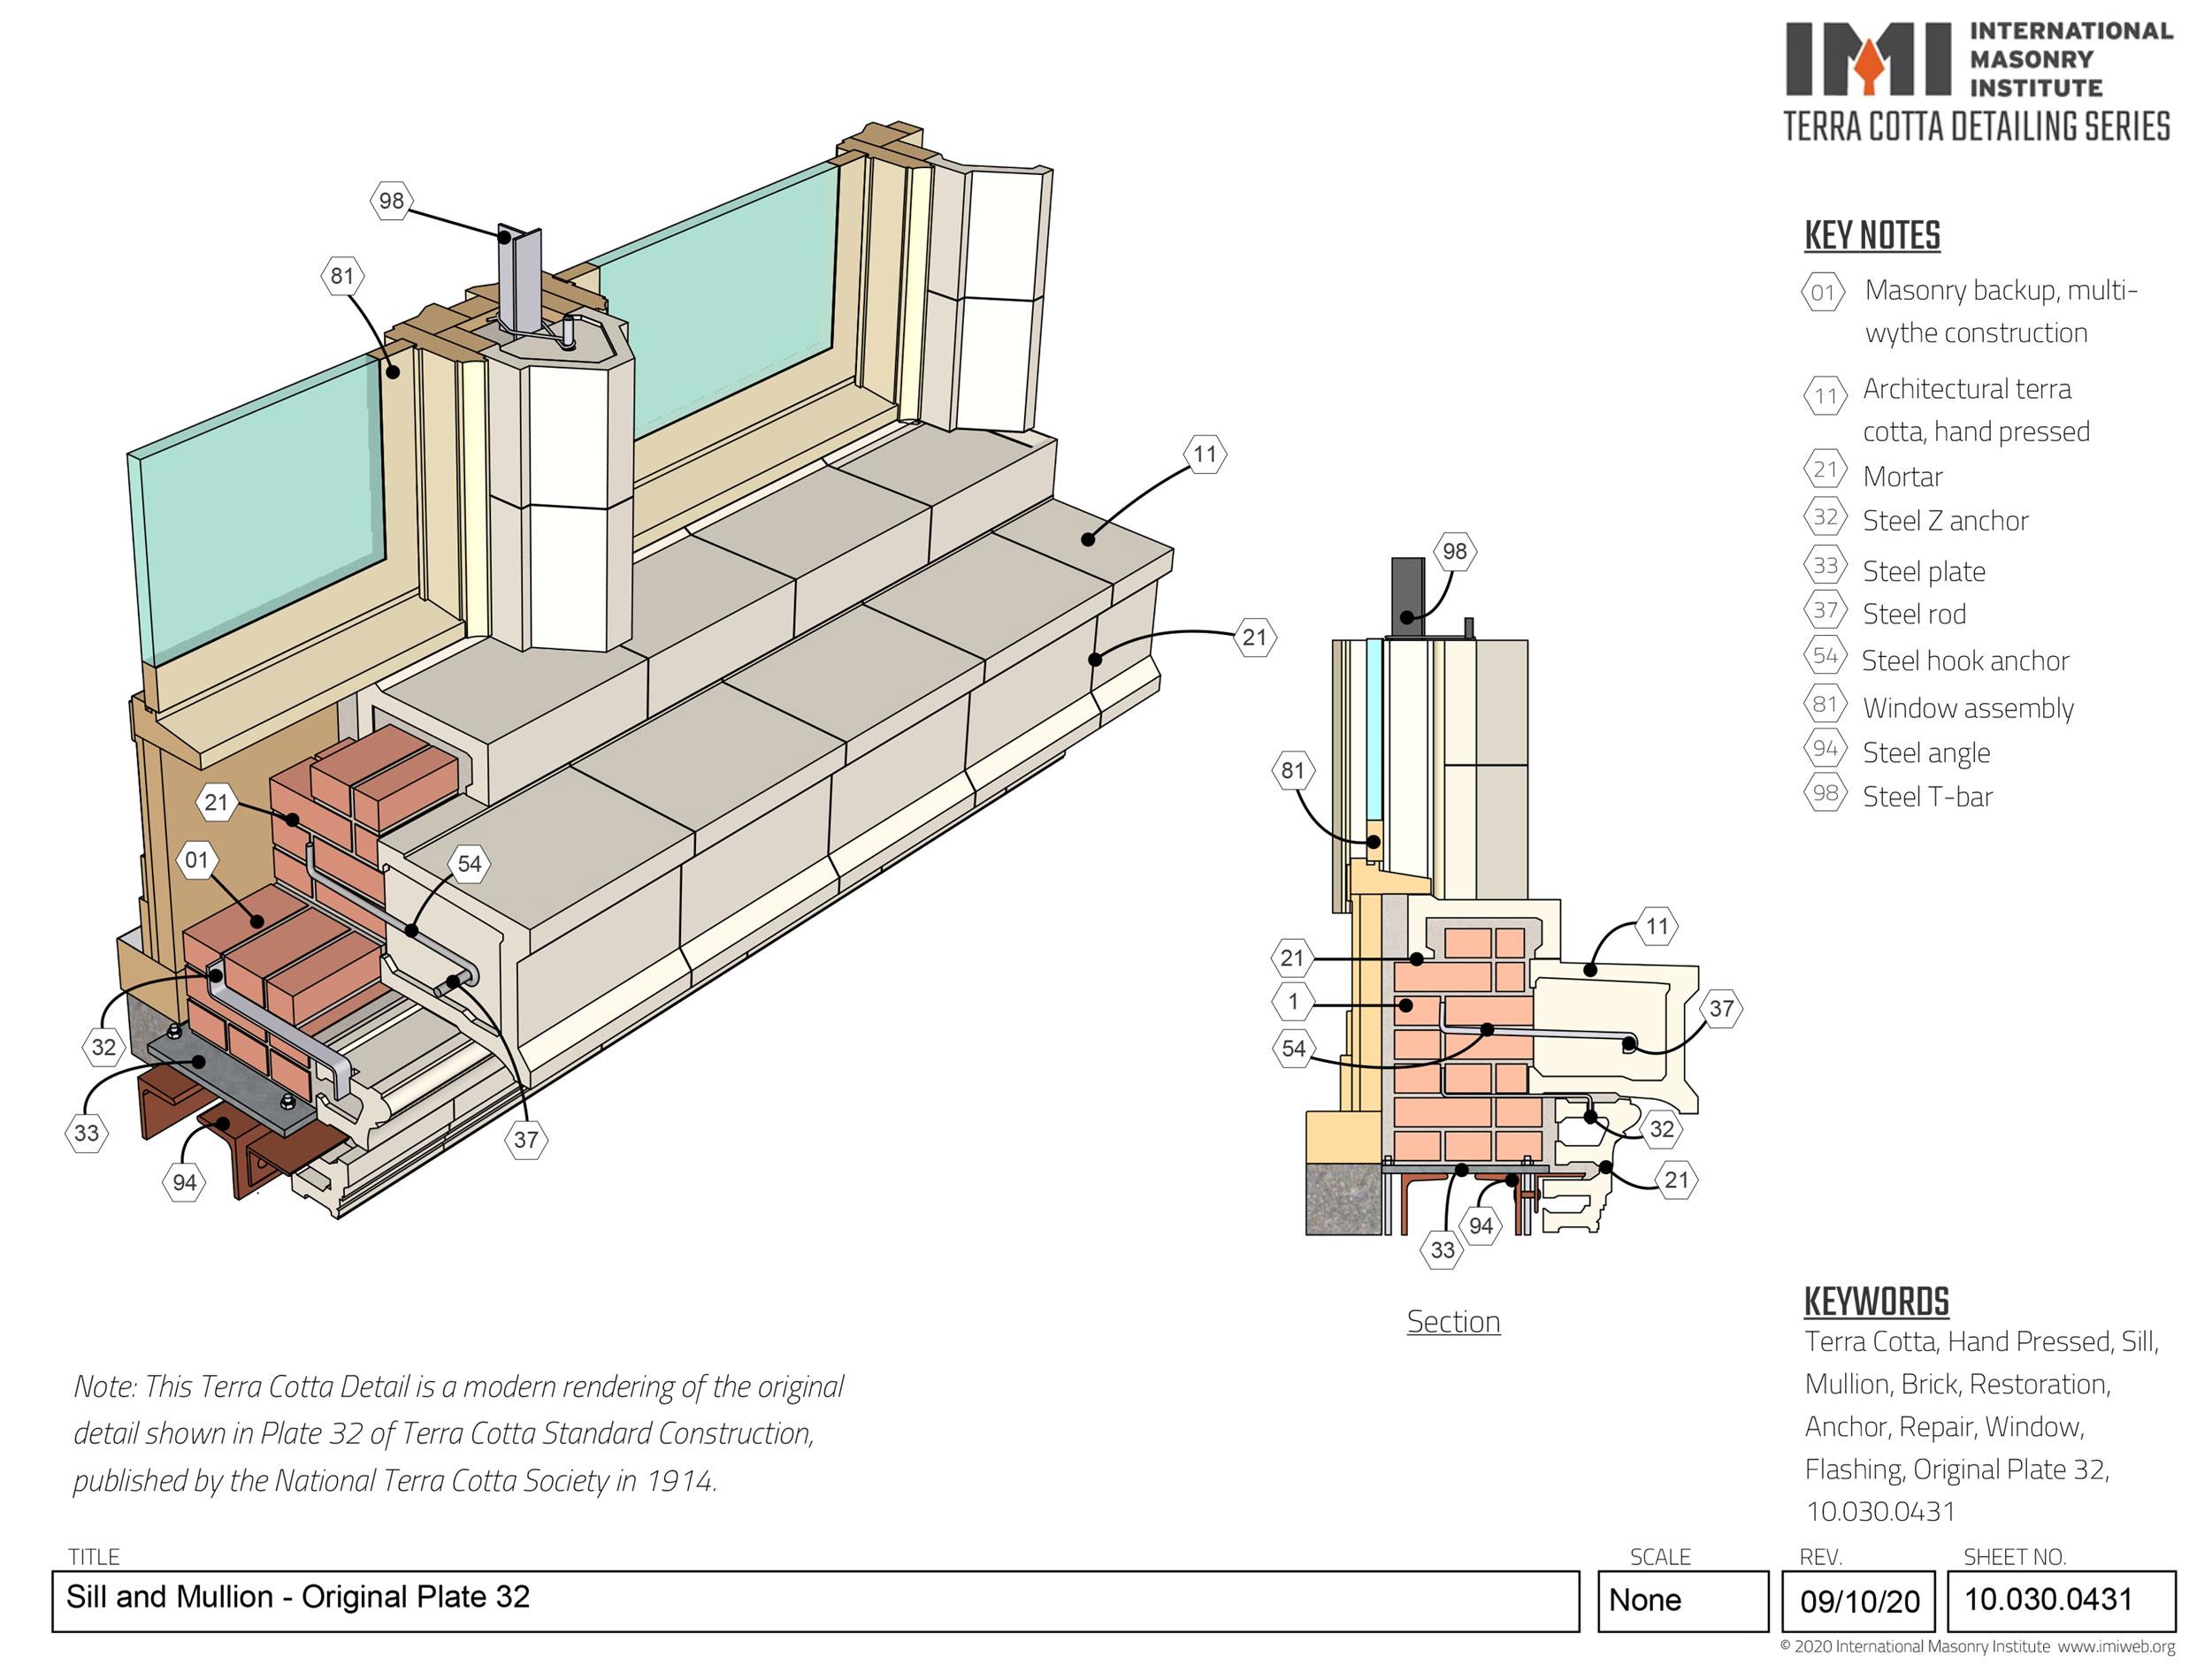 Pressed terra cotta sill and mullion rebuild detail